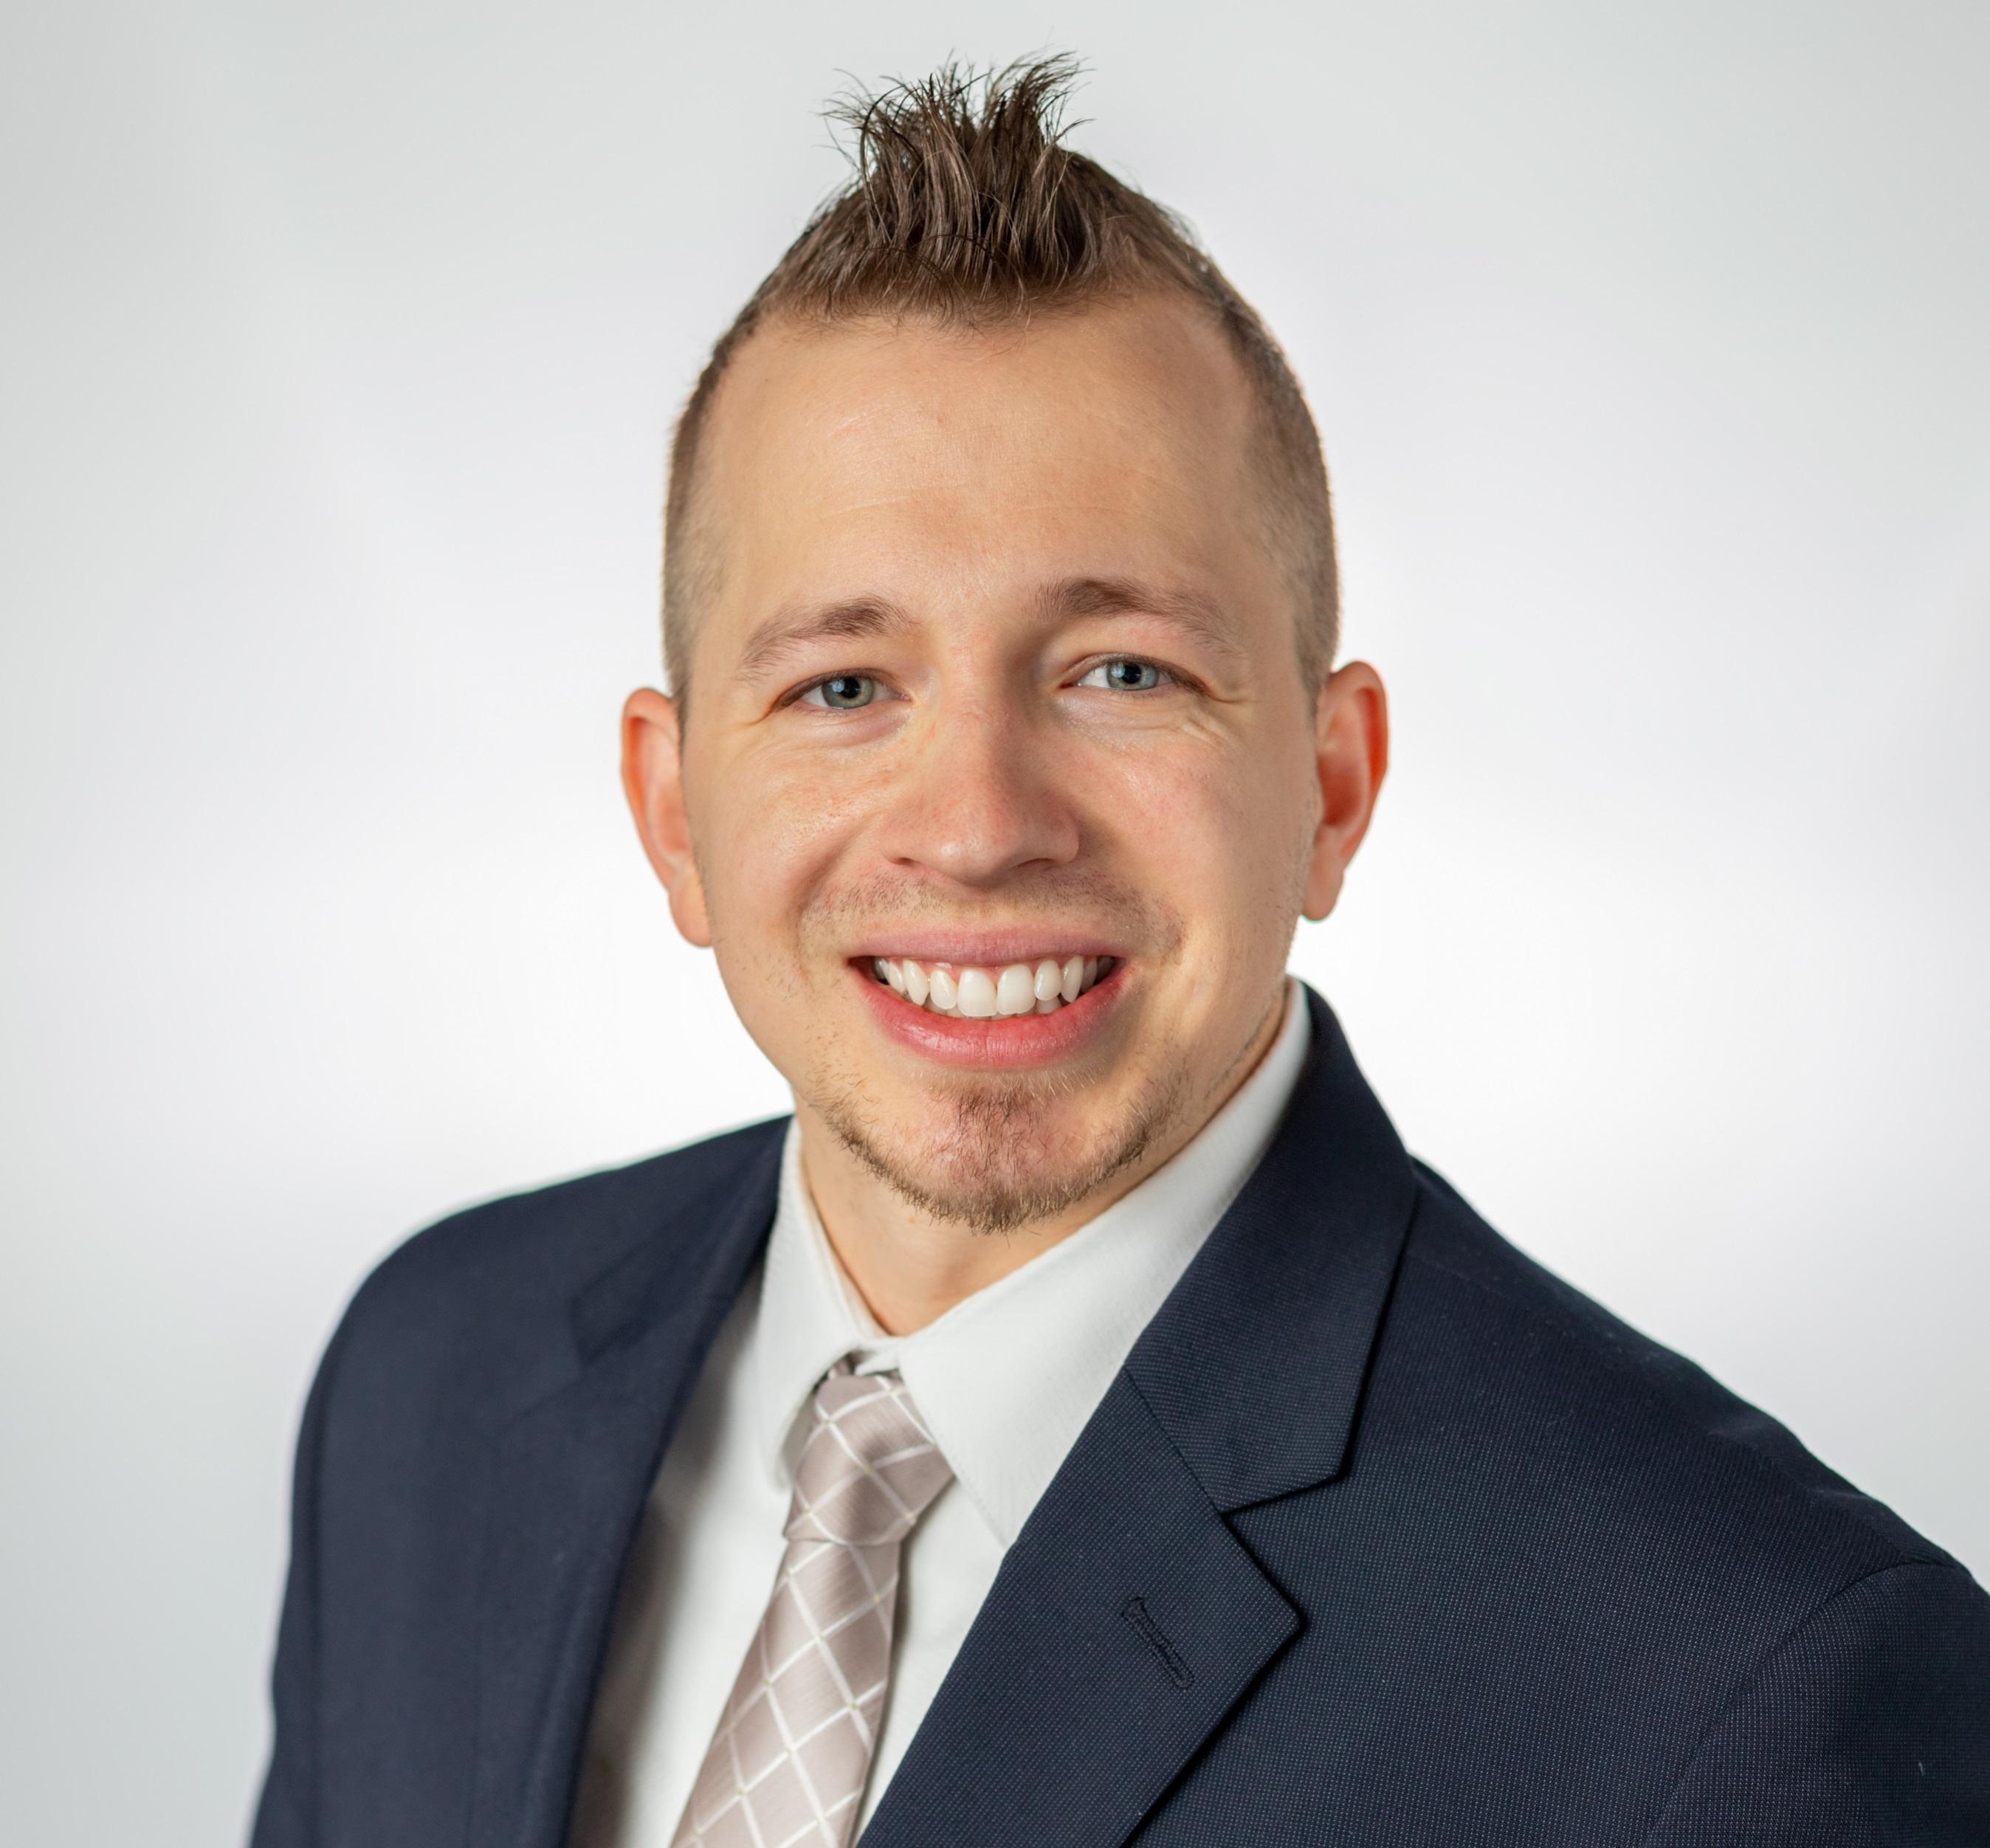 JARROD HODGES  Your Registered Representative & Insurance Agent